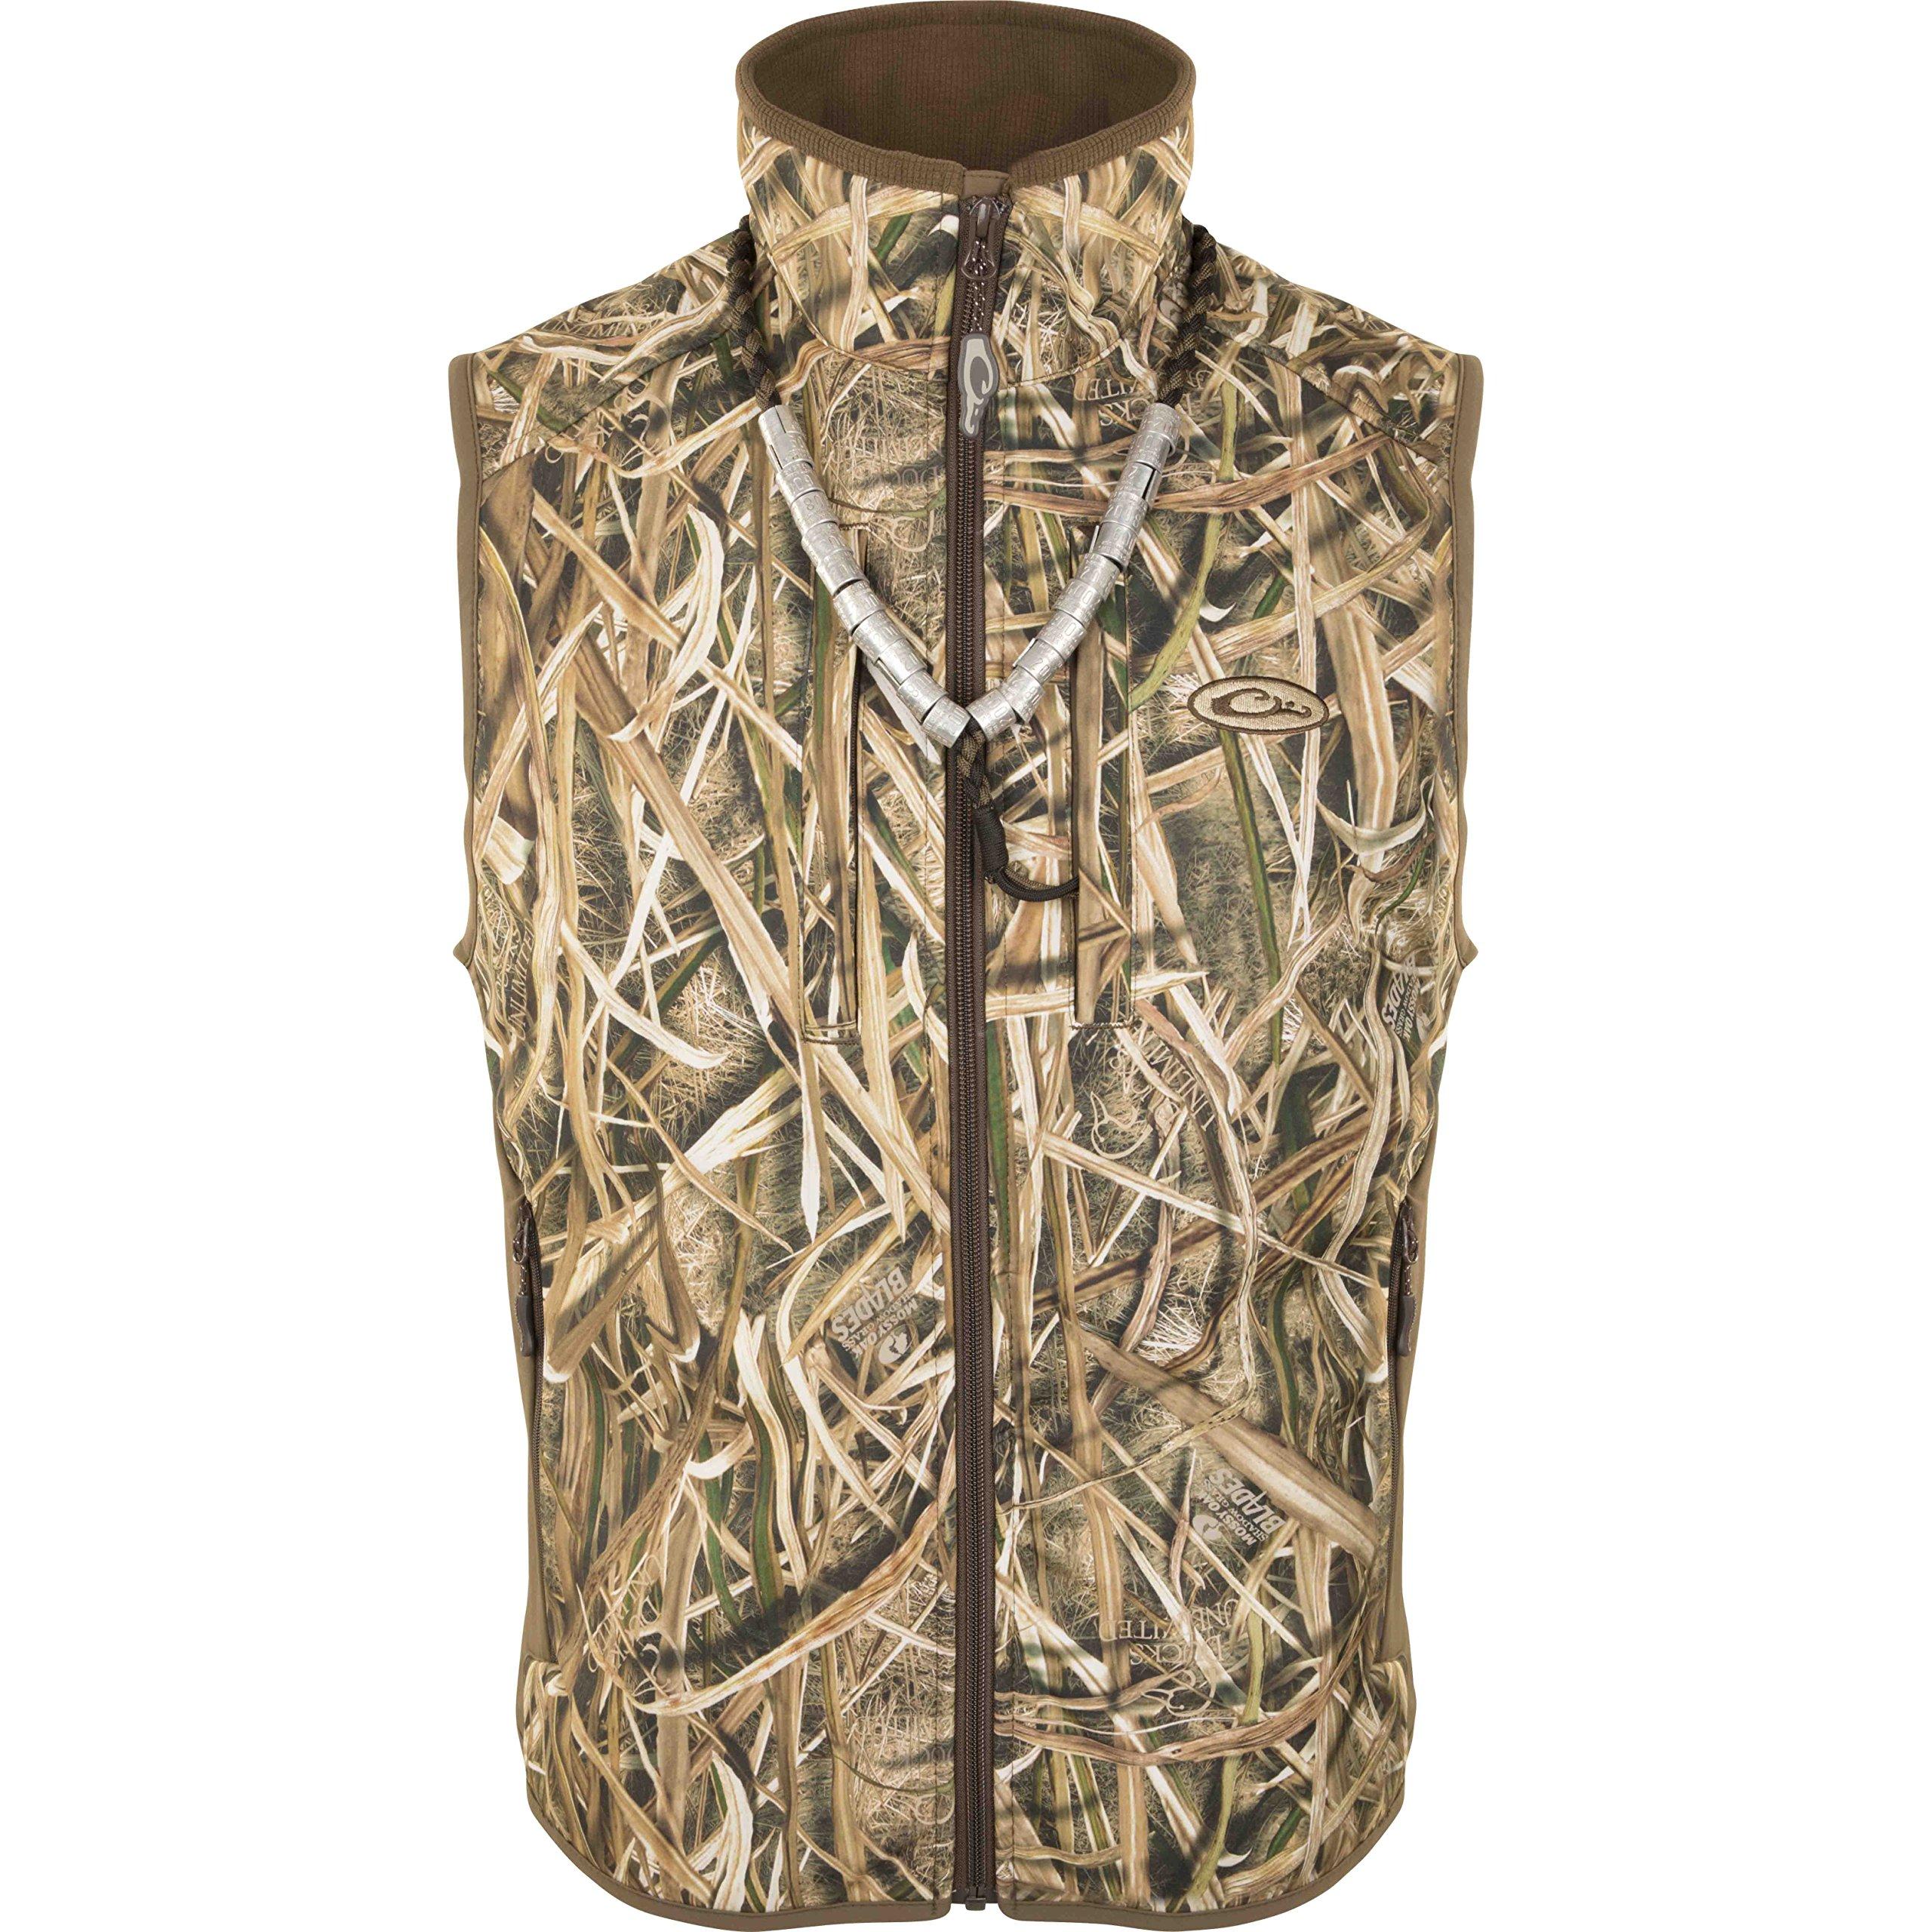 Drake EST Windproof Tech Vest Blades Small